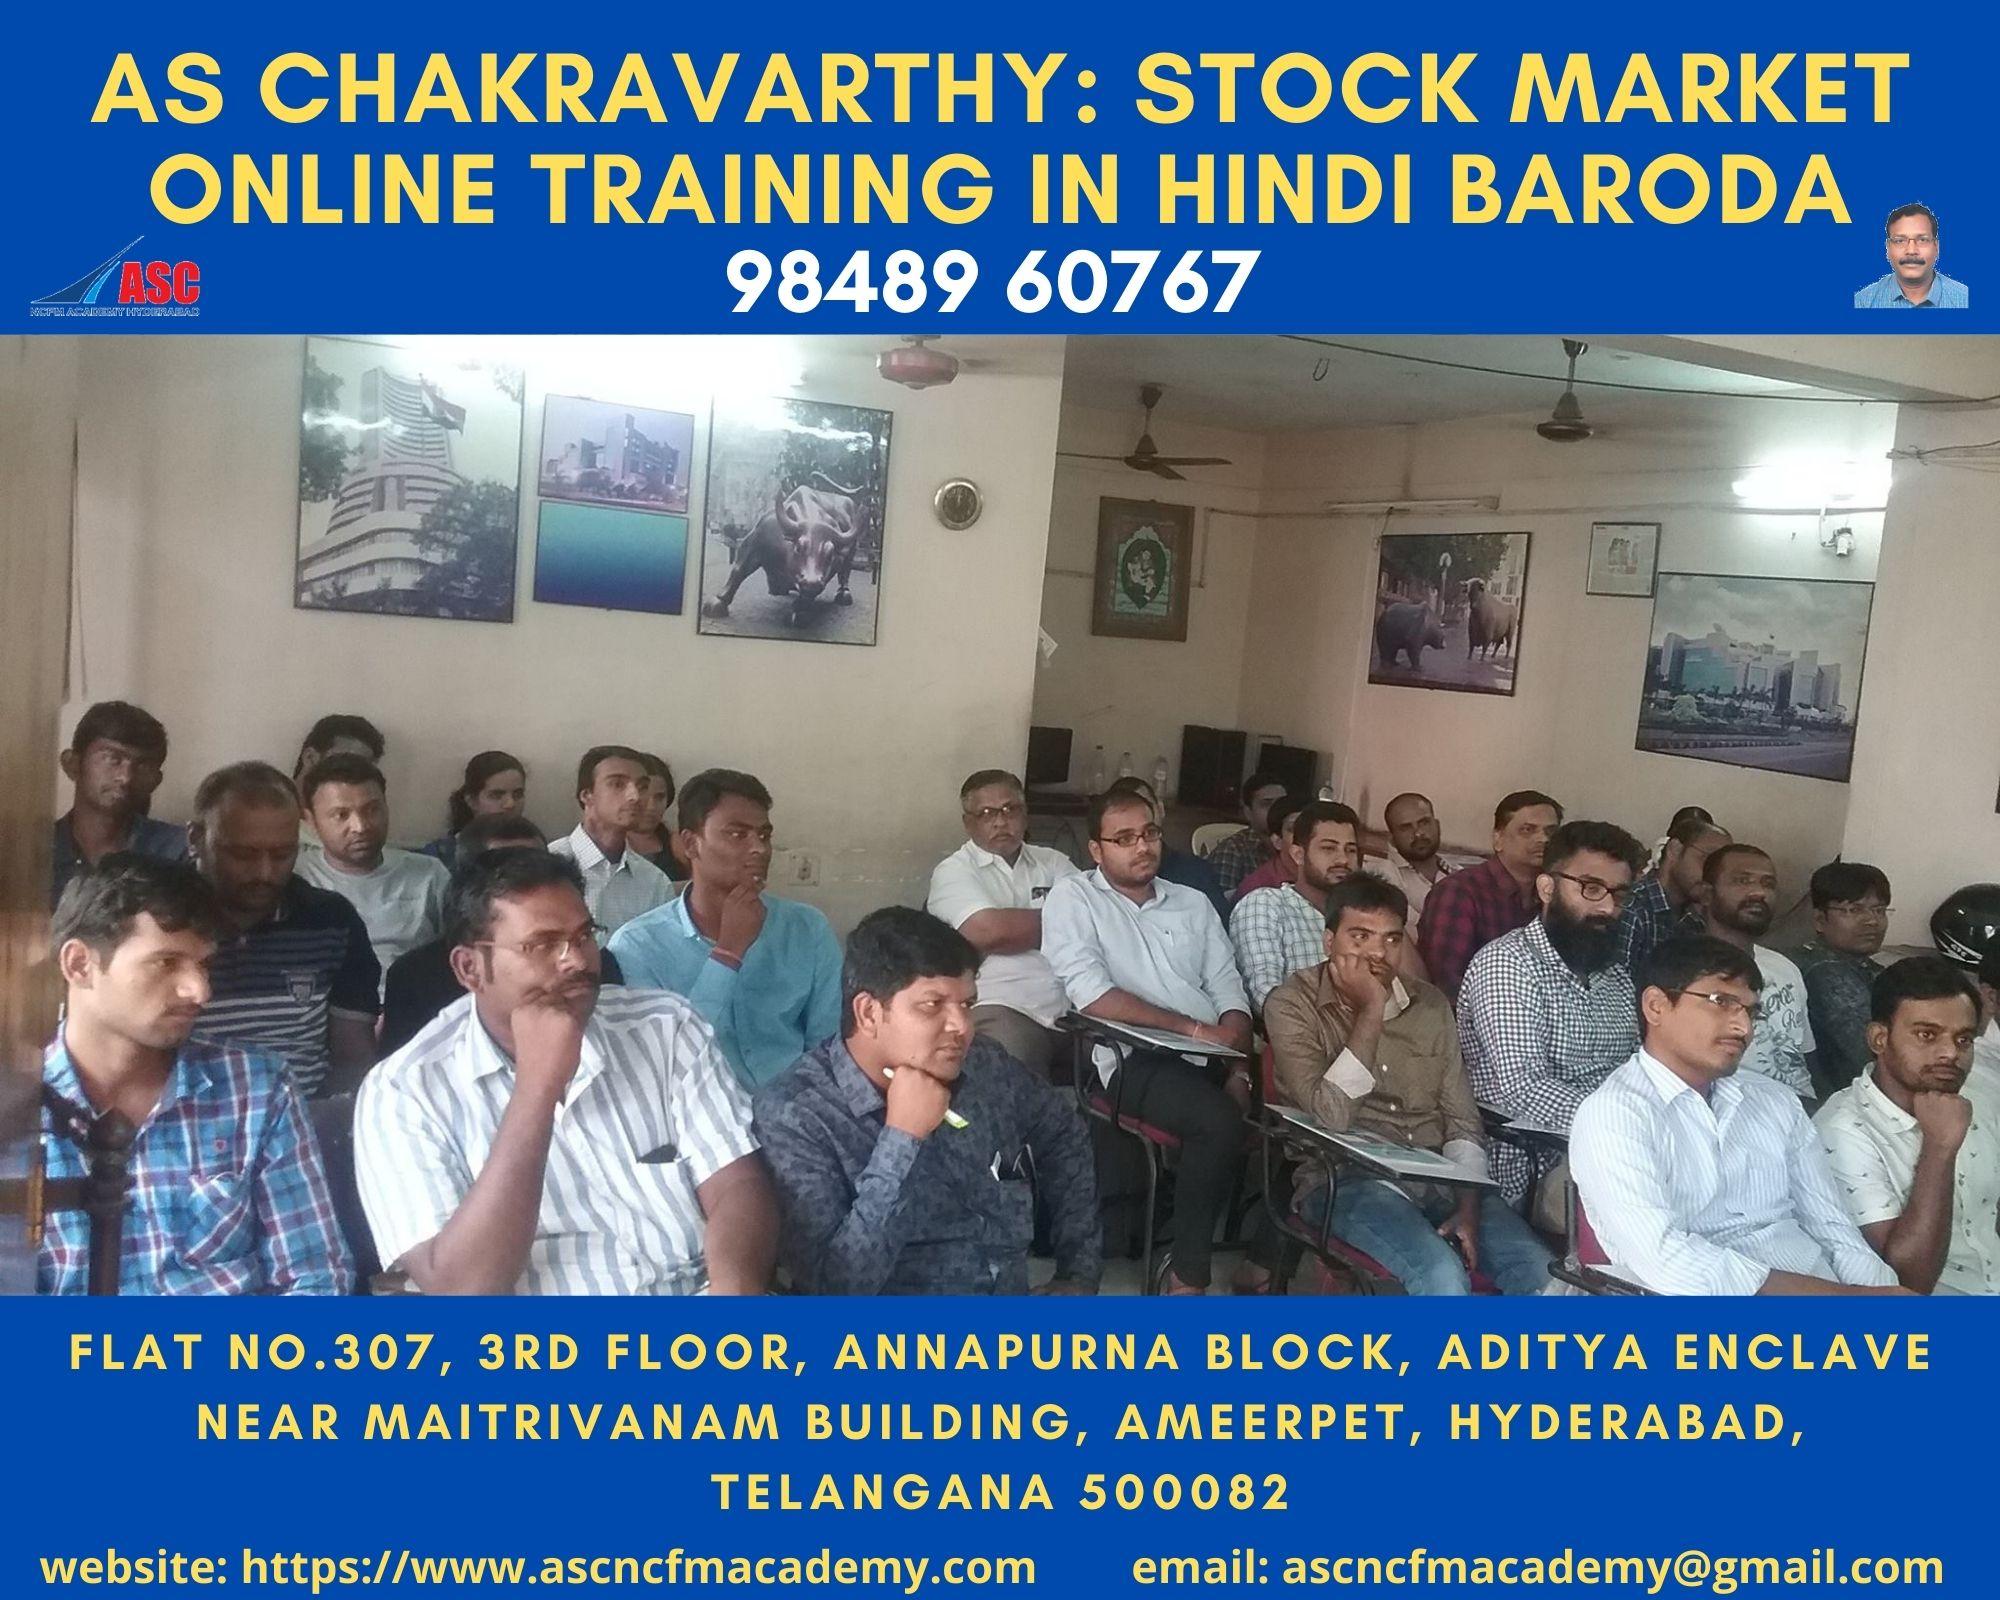 Online Stock Market Technical Training in Hindi Baroda